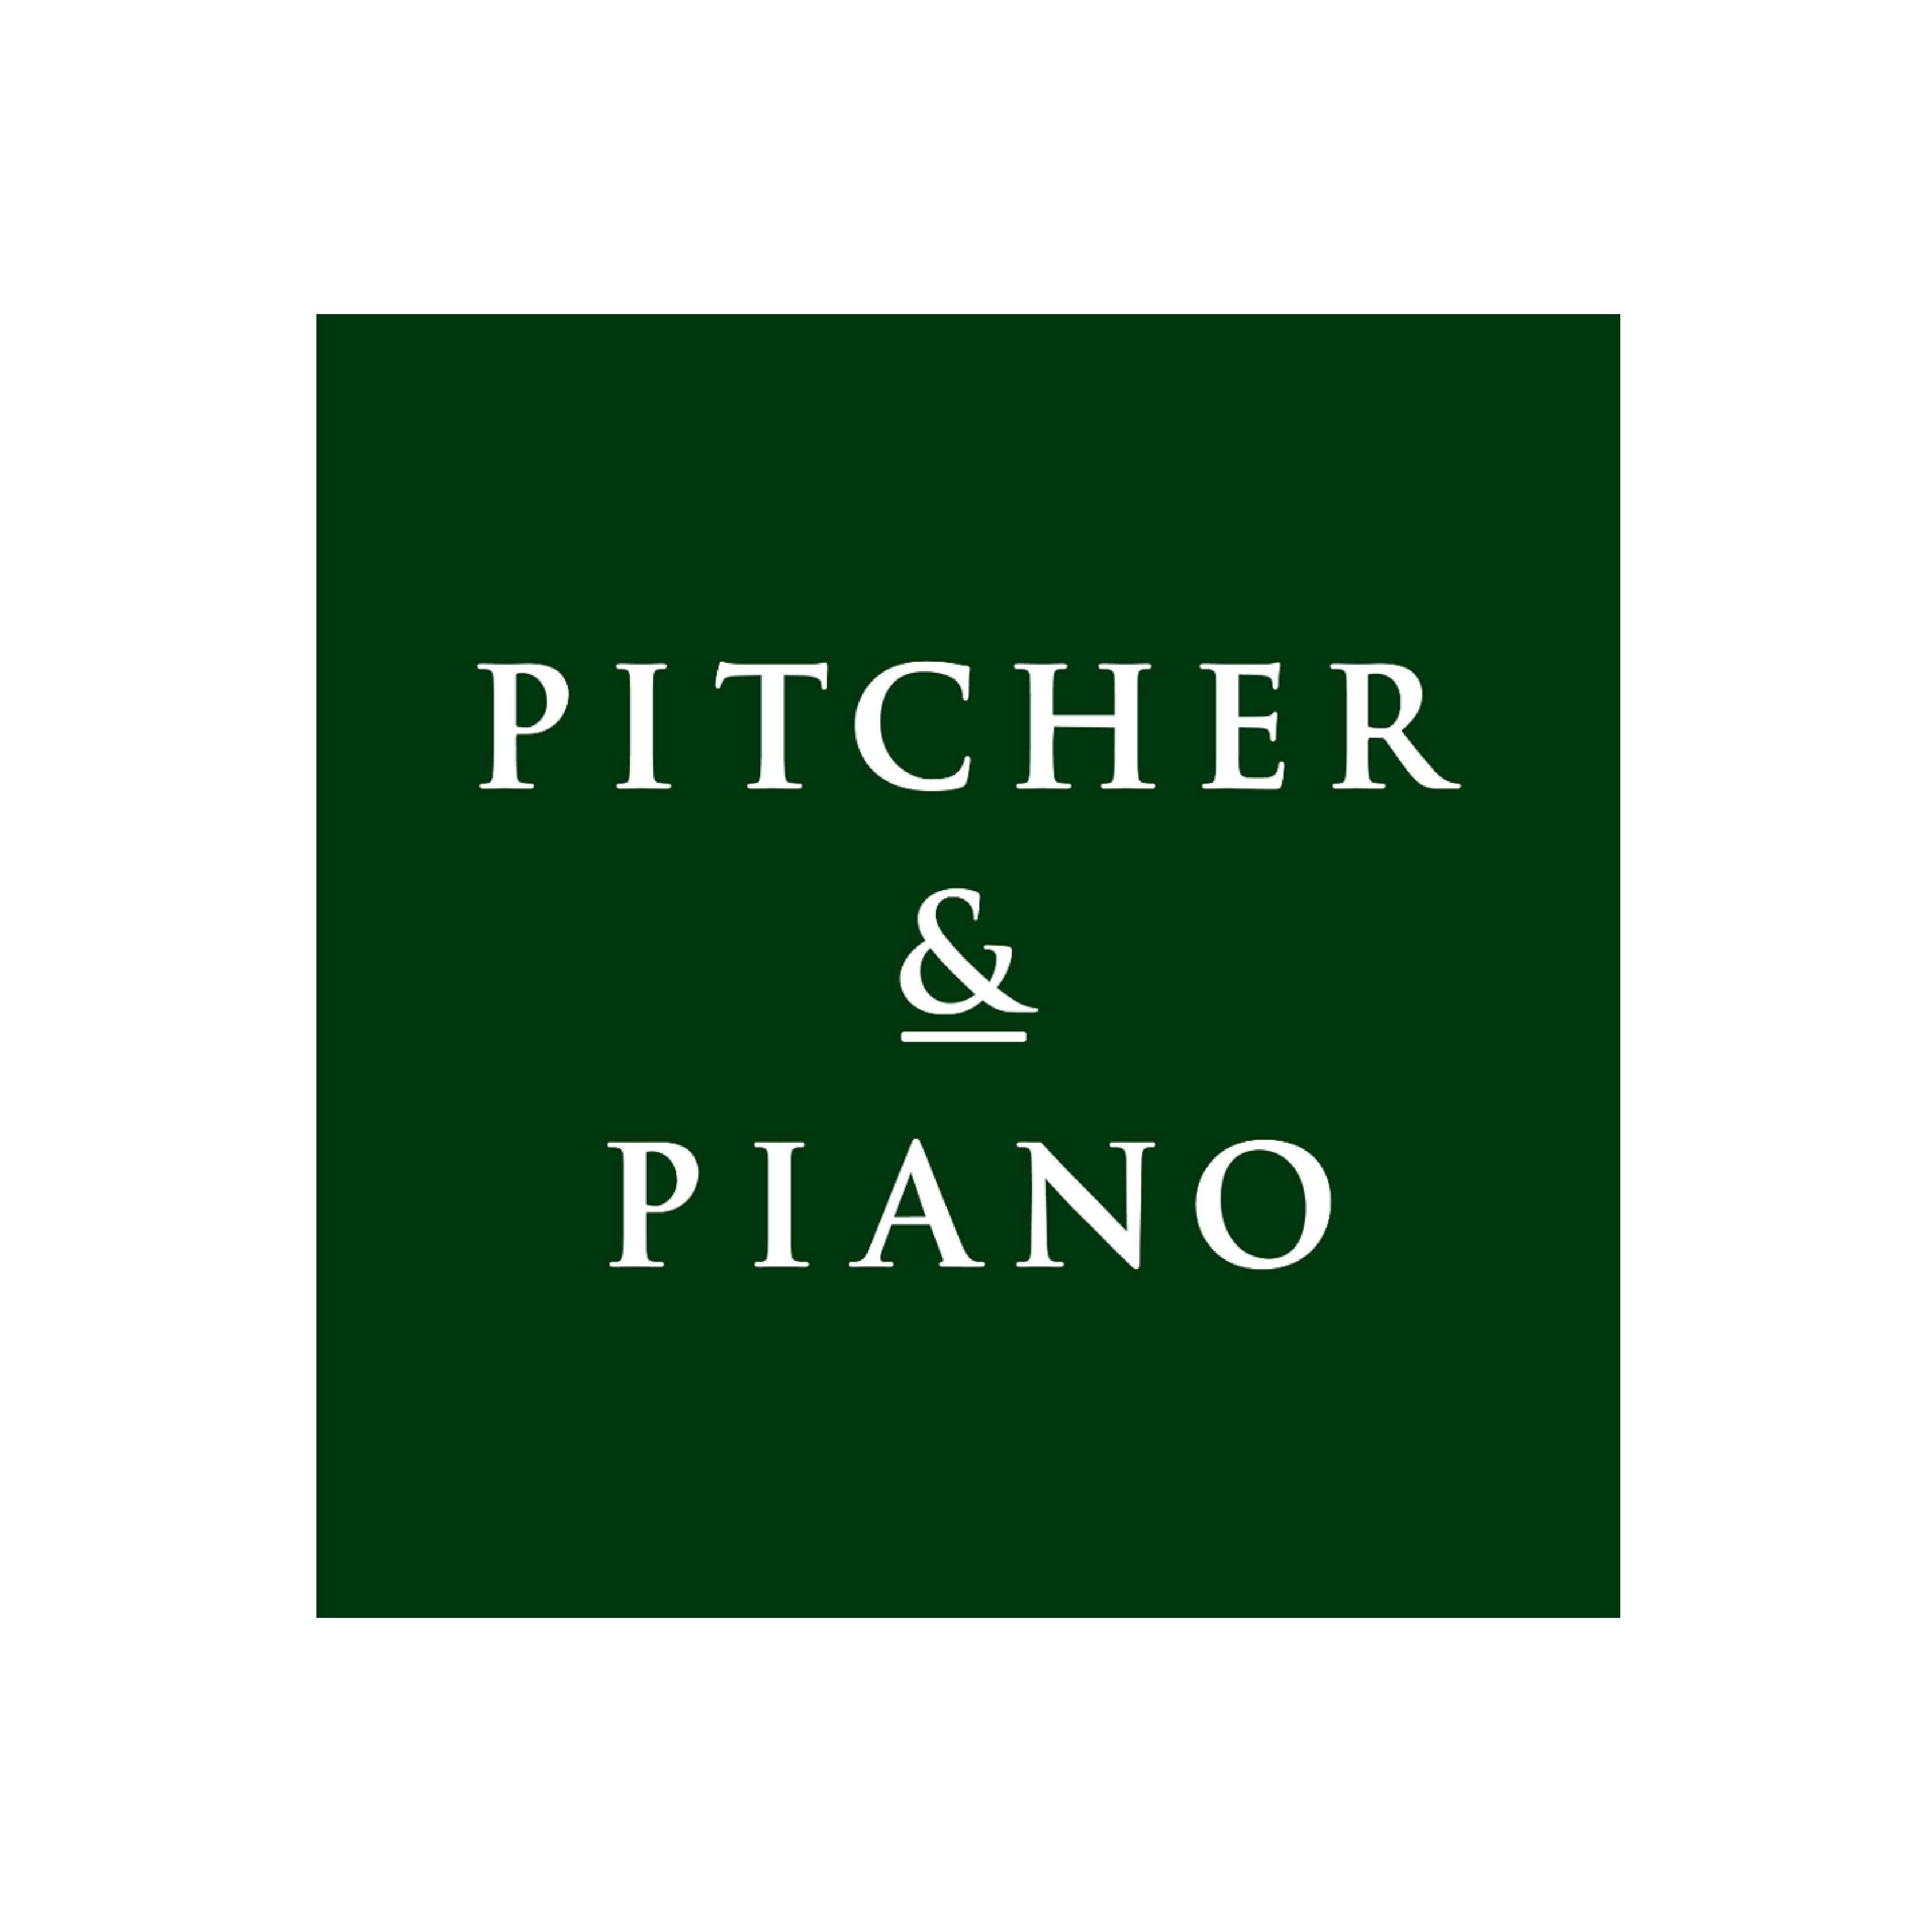 Pitcher & Piano